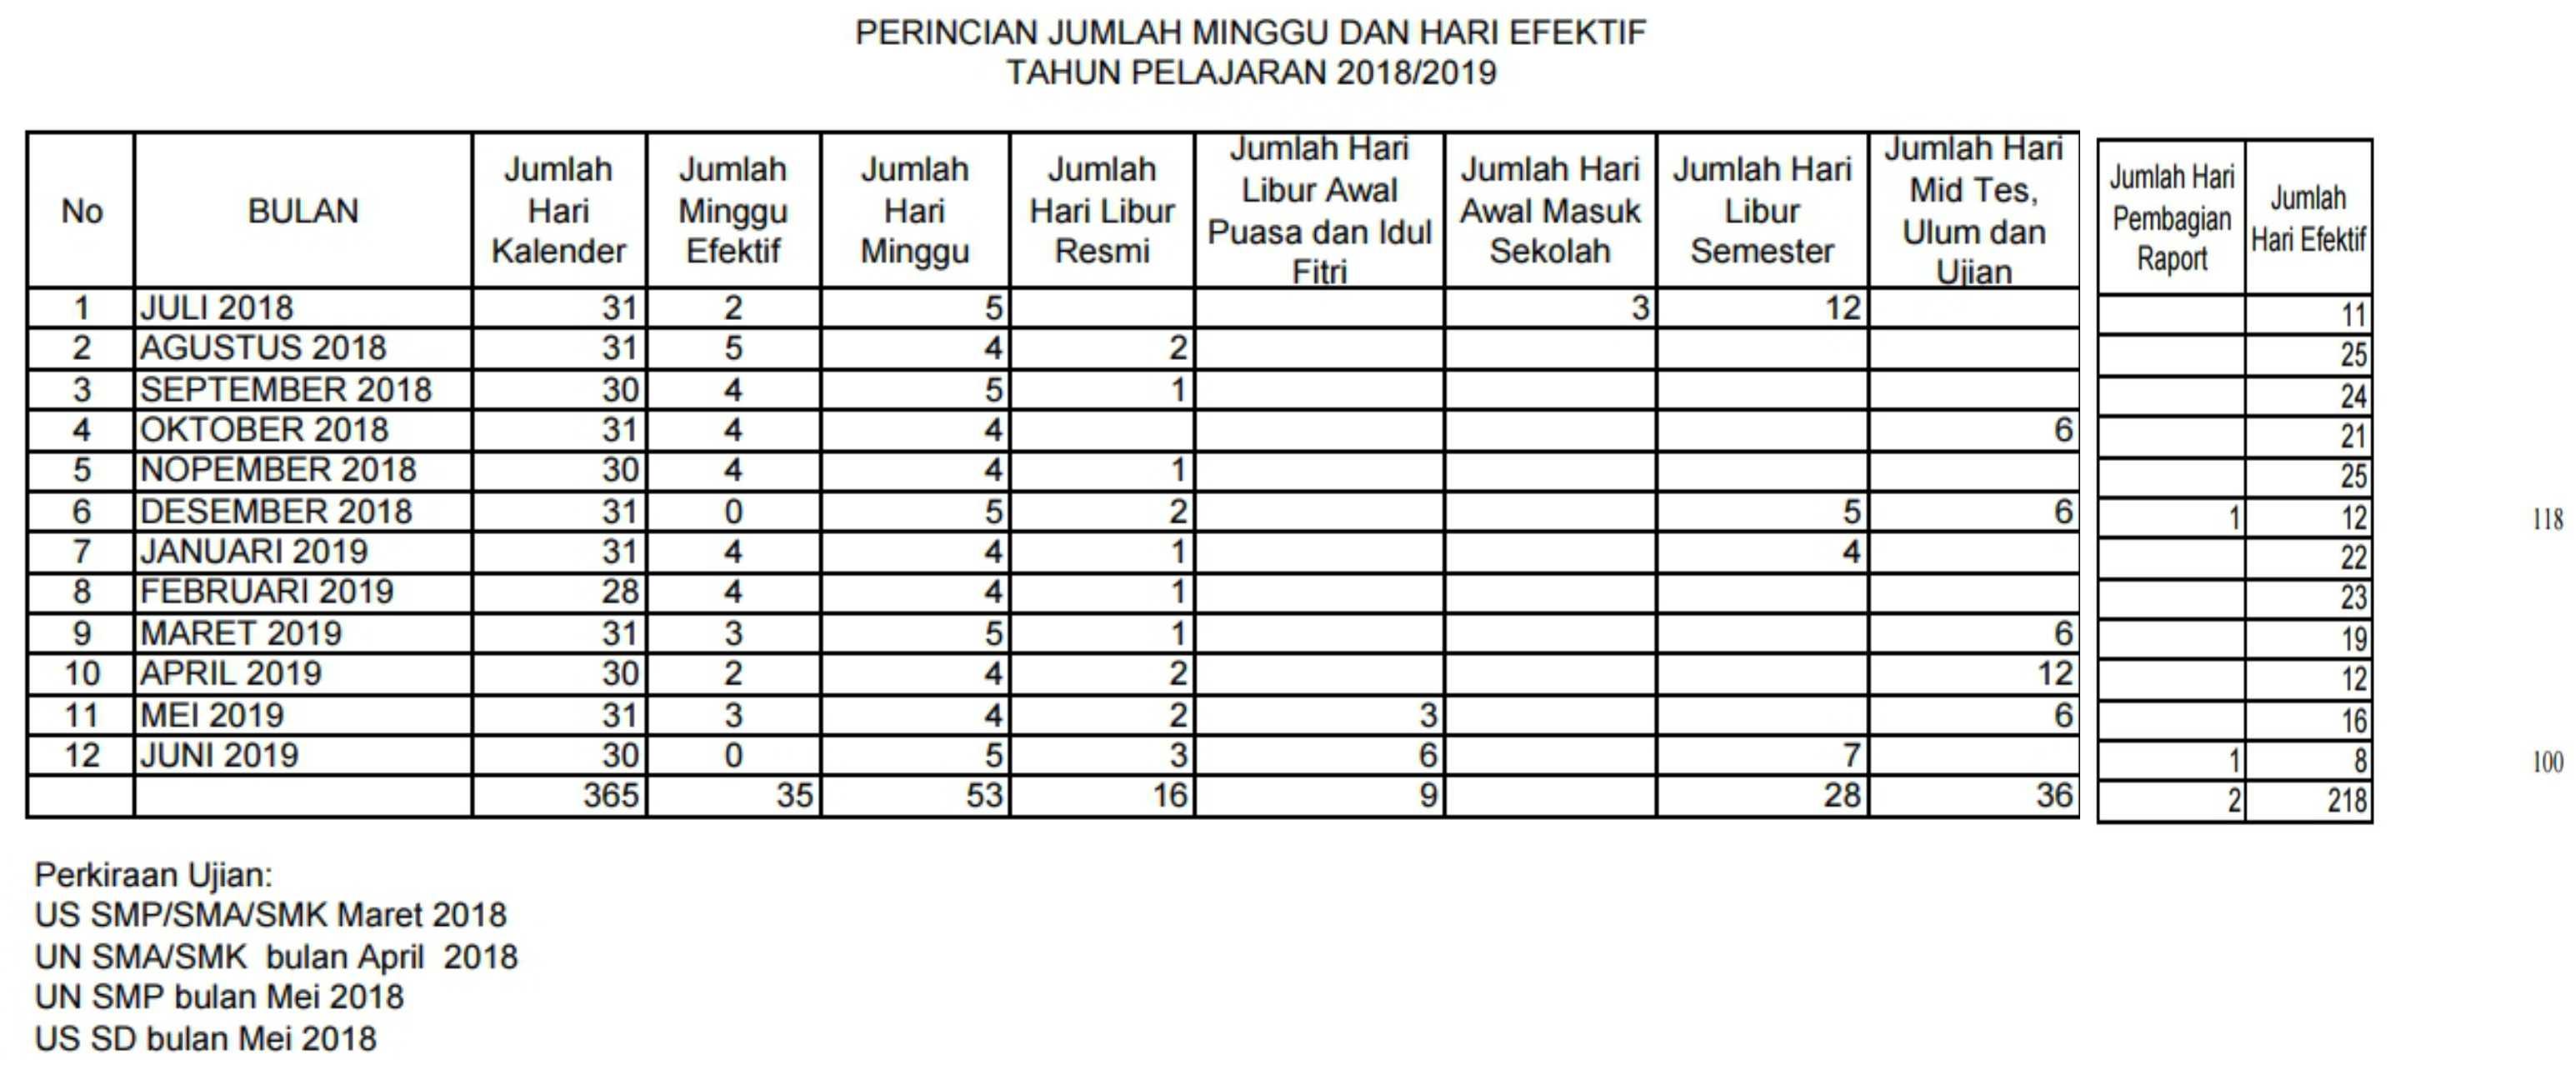 perincian jumlah minggu dan hari efektif tahun pelajaran 2018-1019 provinsi banten